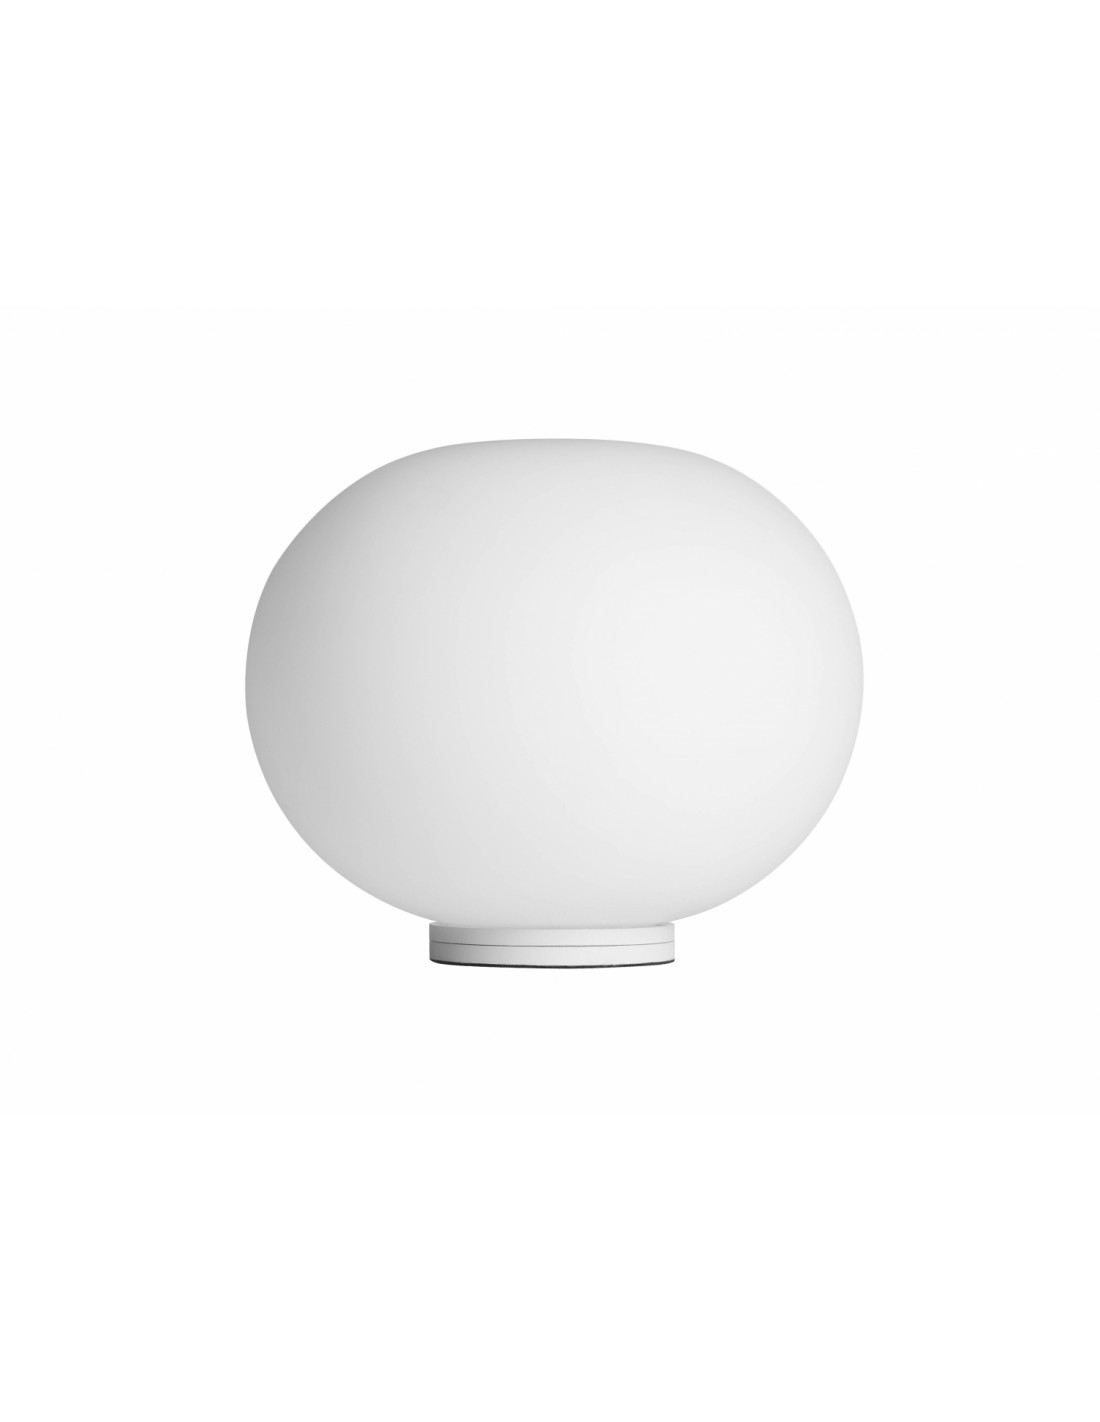 Applique/ plafonnier Flos Glo-Ball C/W zéro blanche